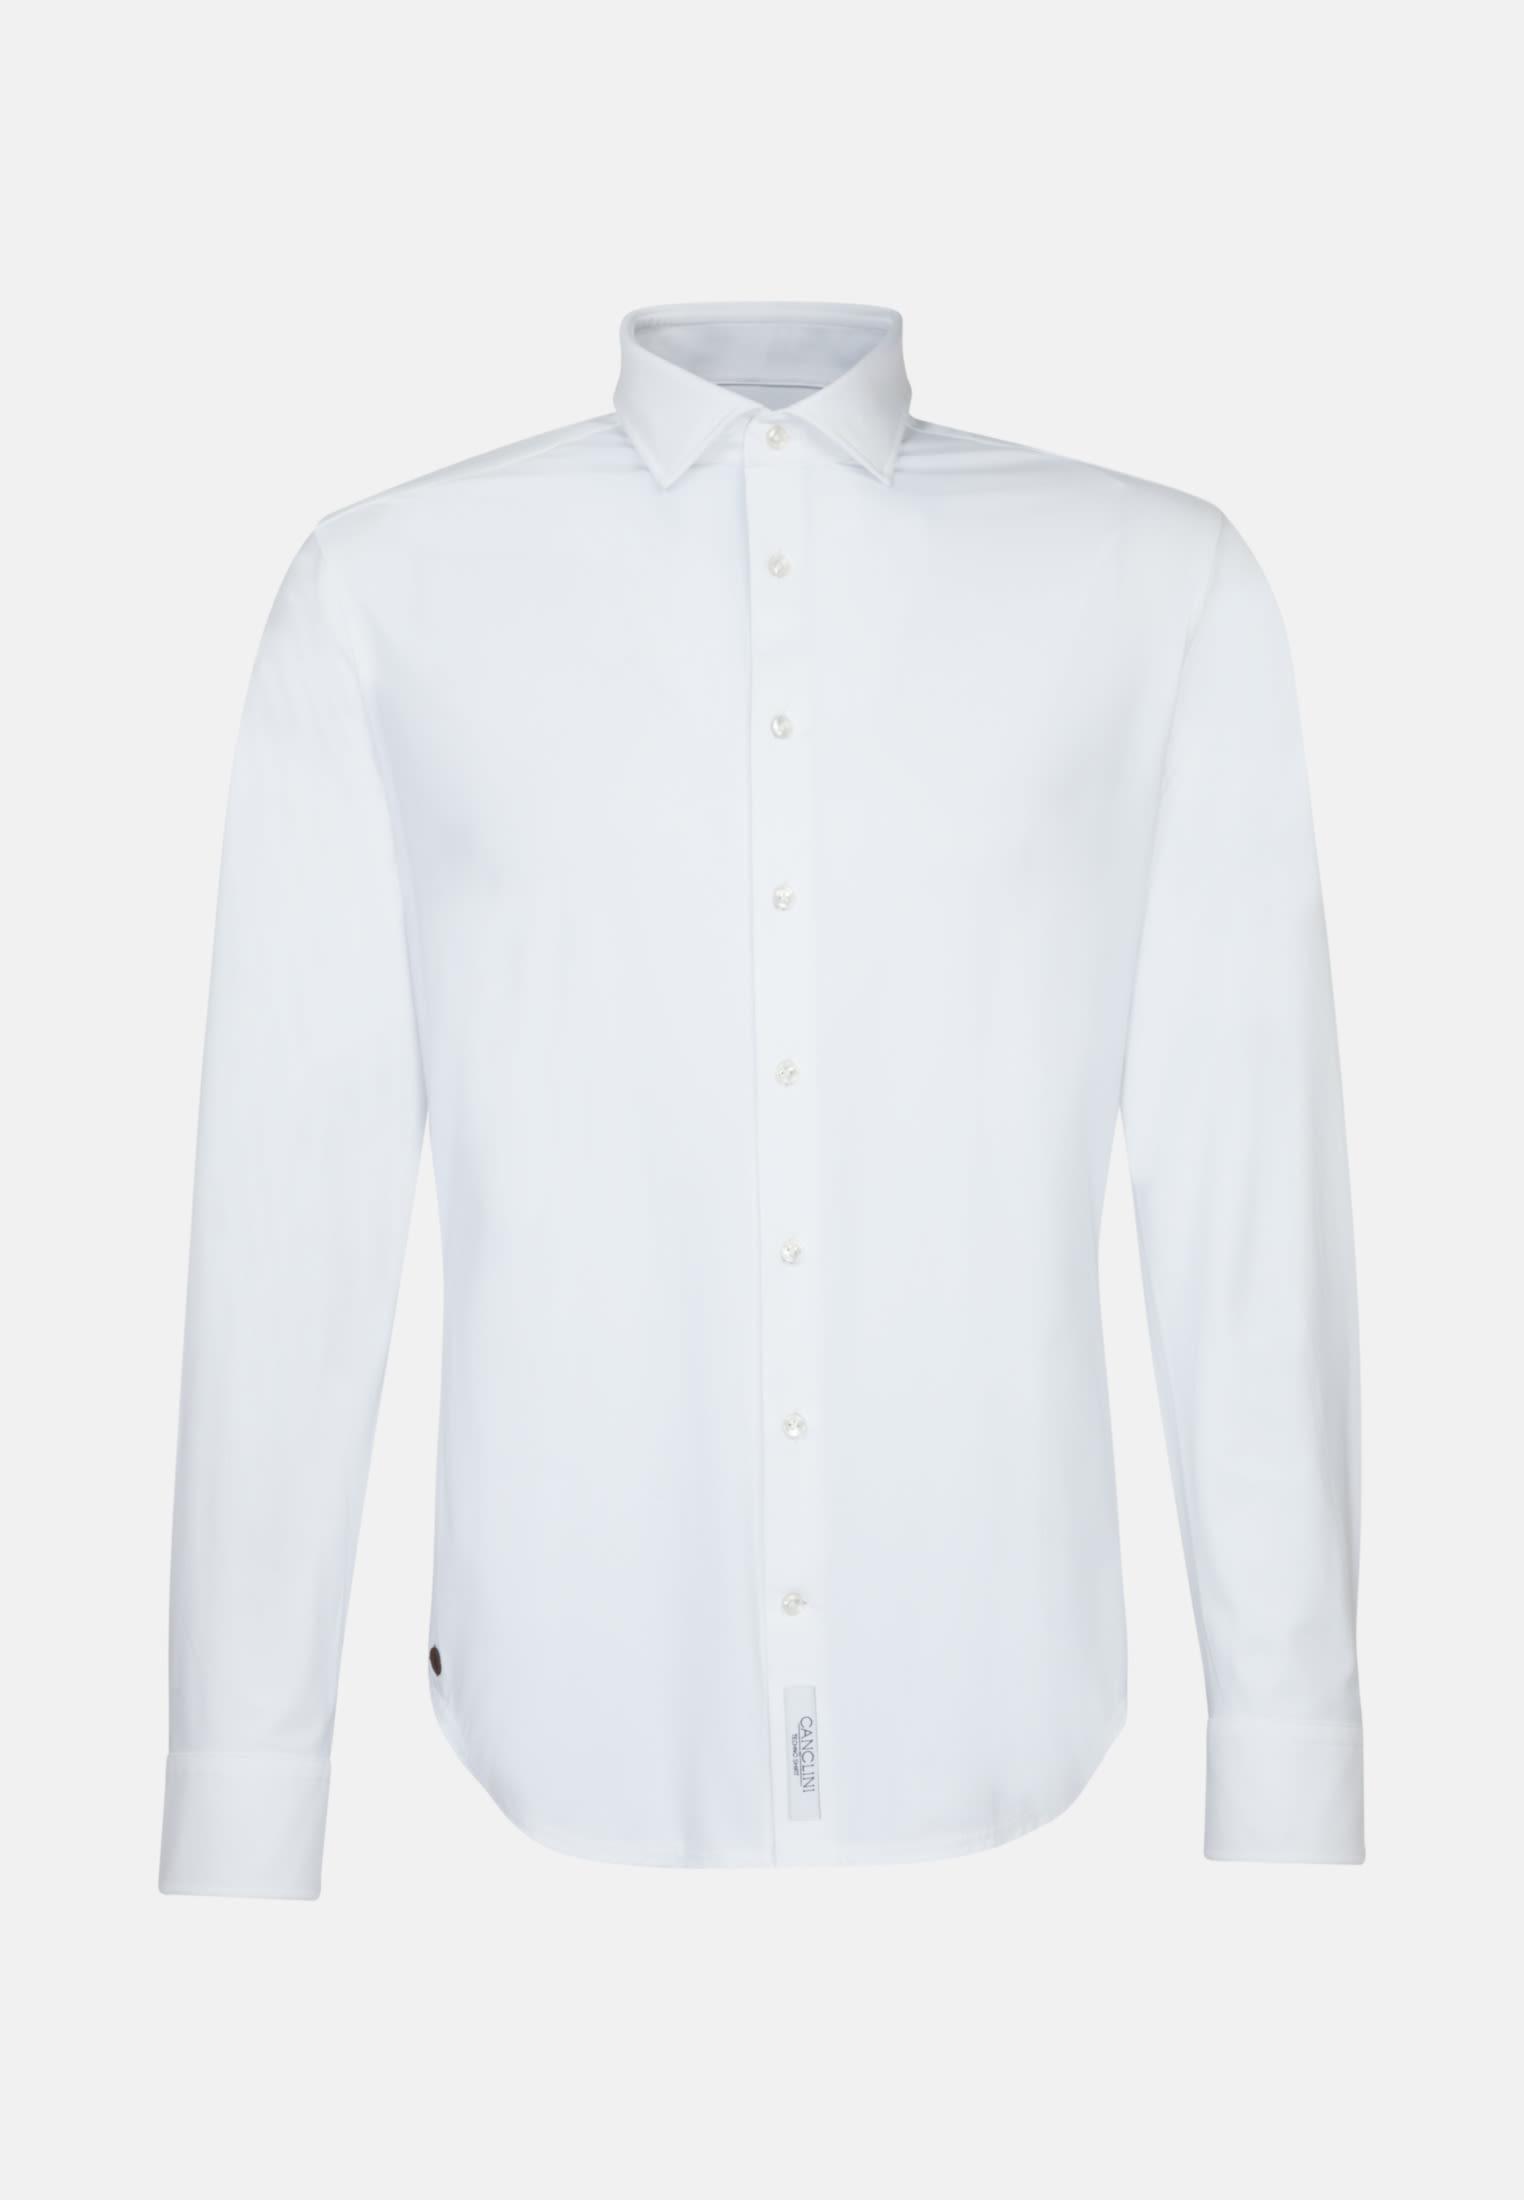 Jersey Smart Casual Hemd in Perfect Fit mit Haifischkragen in Weiß |  Jacques Britt Onlineshop